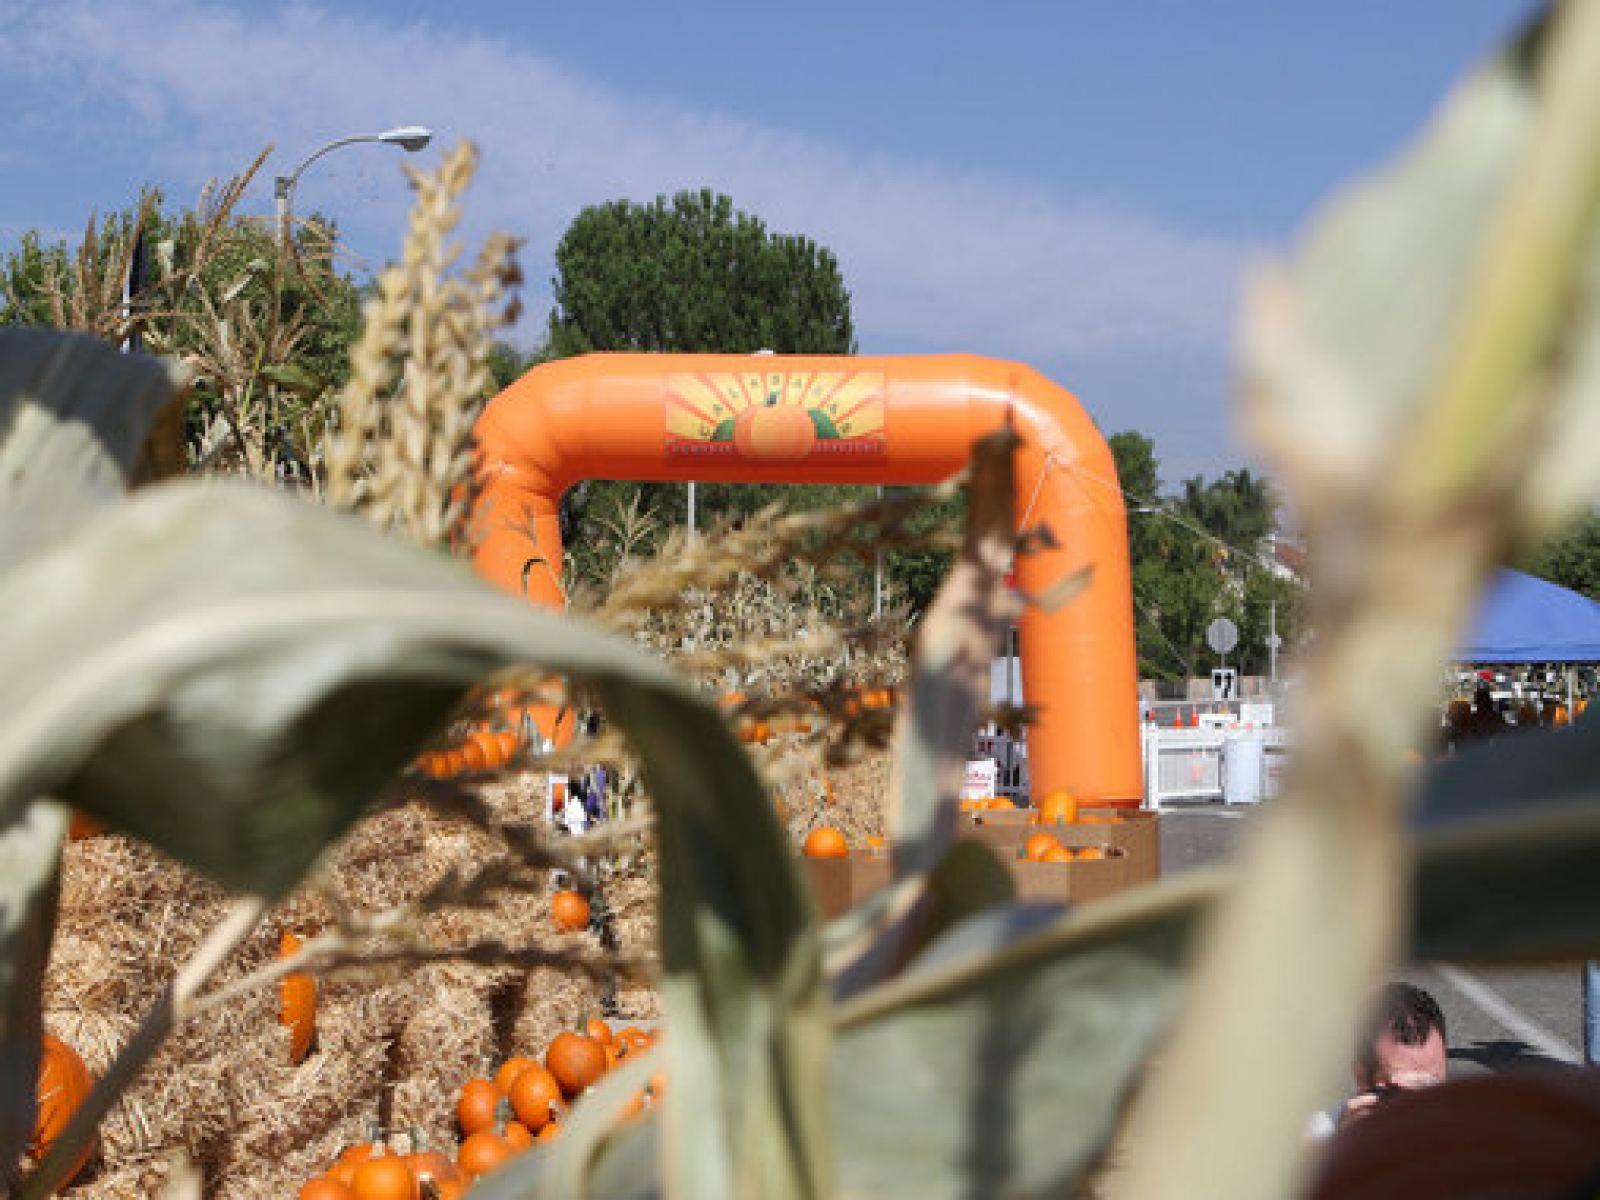 Main image for event titled Calabasas Pumpkin Festival